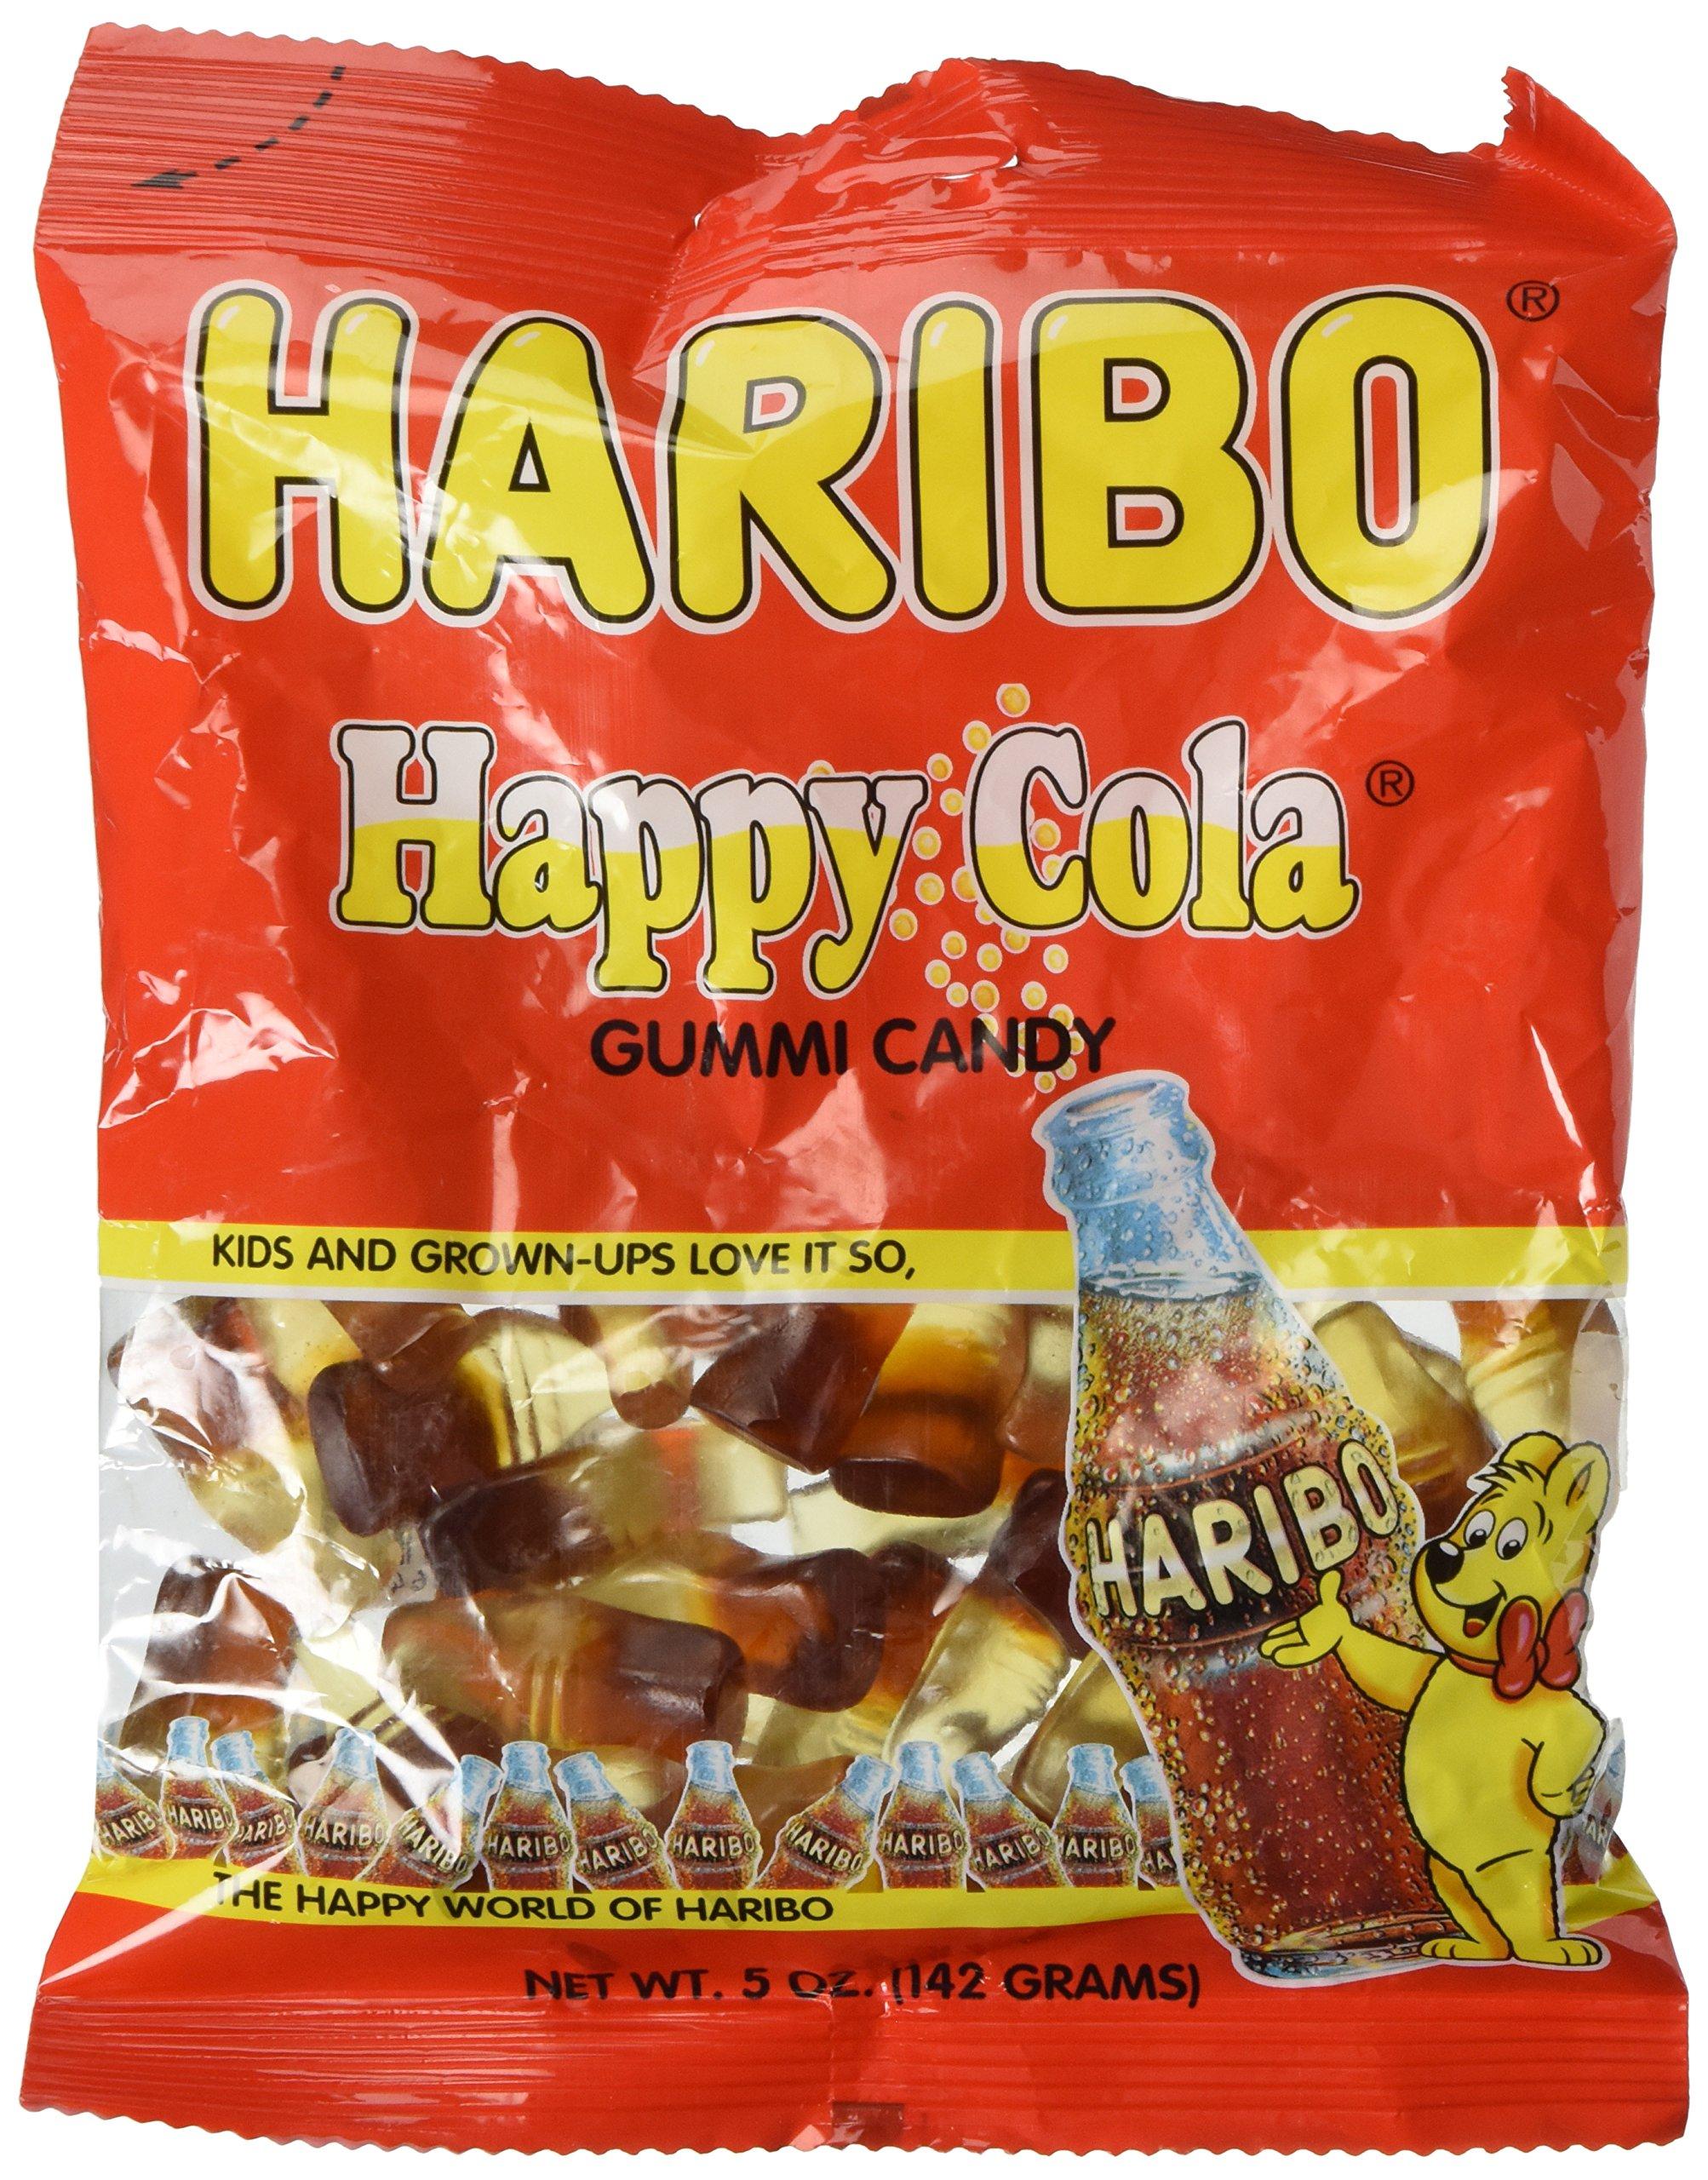 Haribo Gummi Candy, Happy-Cola, 5-Ounce Bag